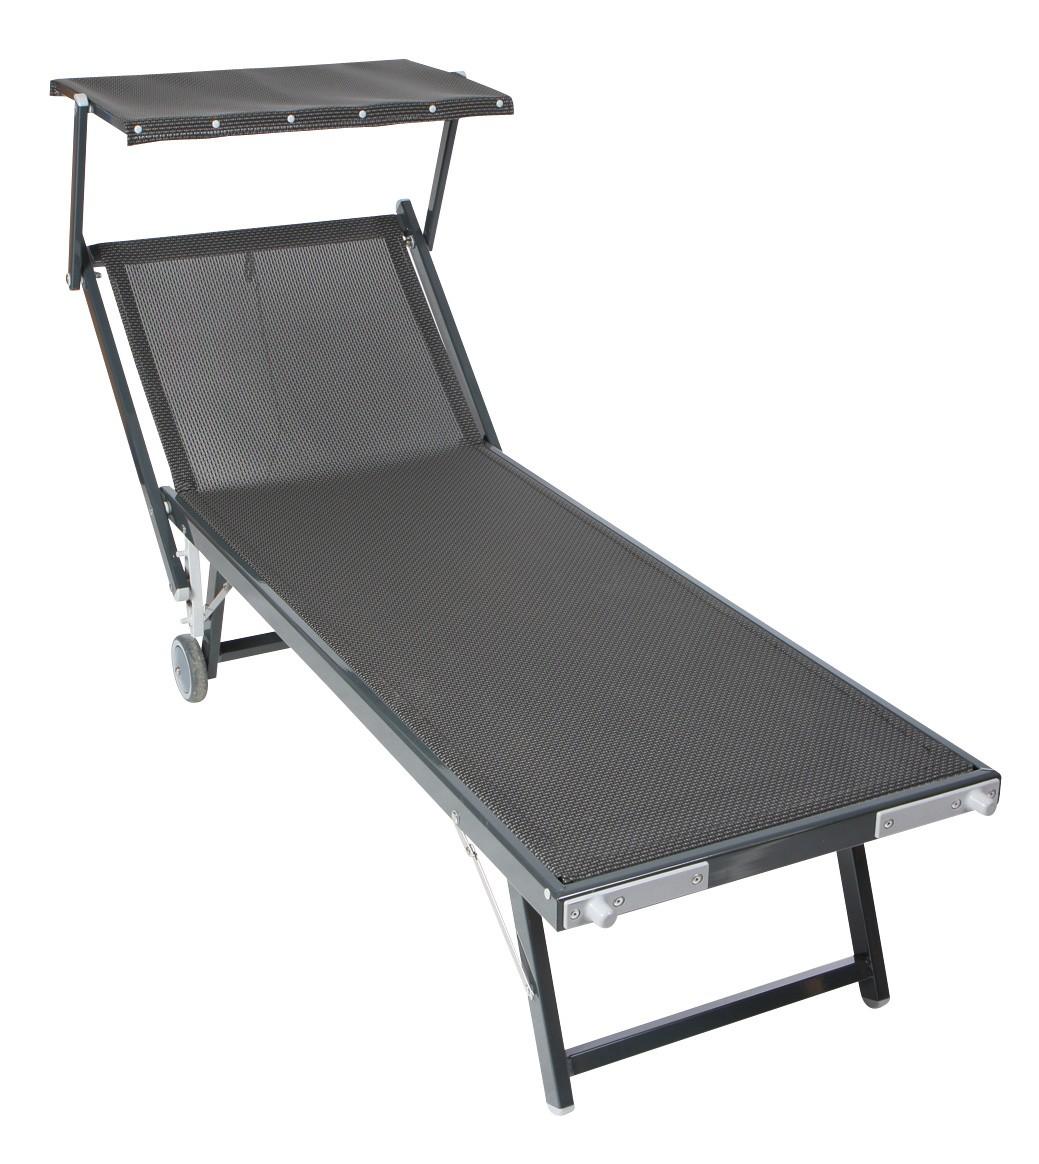 sung rl sonnenliege medici mit sonnendach rollbar alu anthrazit bei. Black Bedroom Furniture Sets. Home Design Ideas